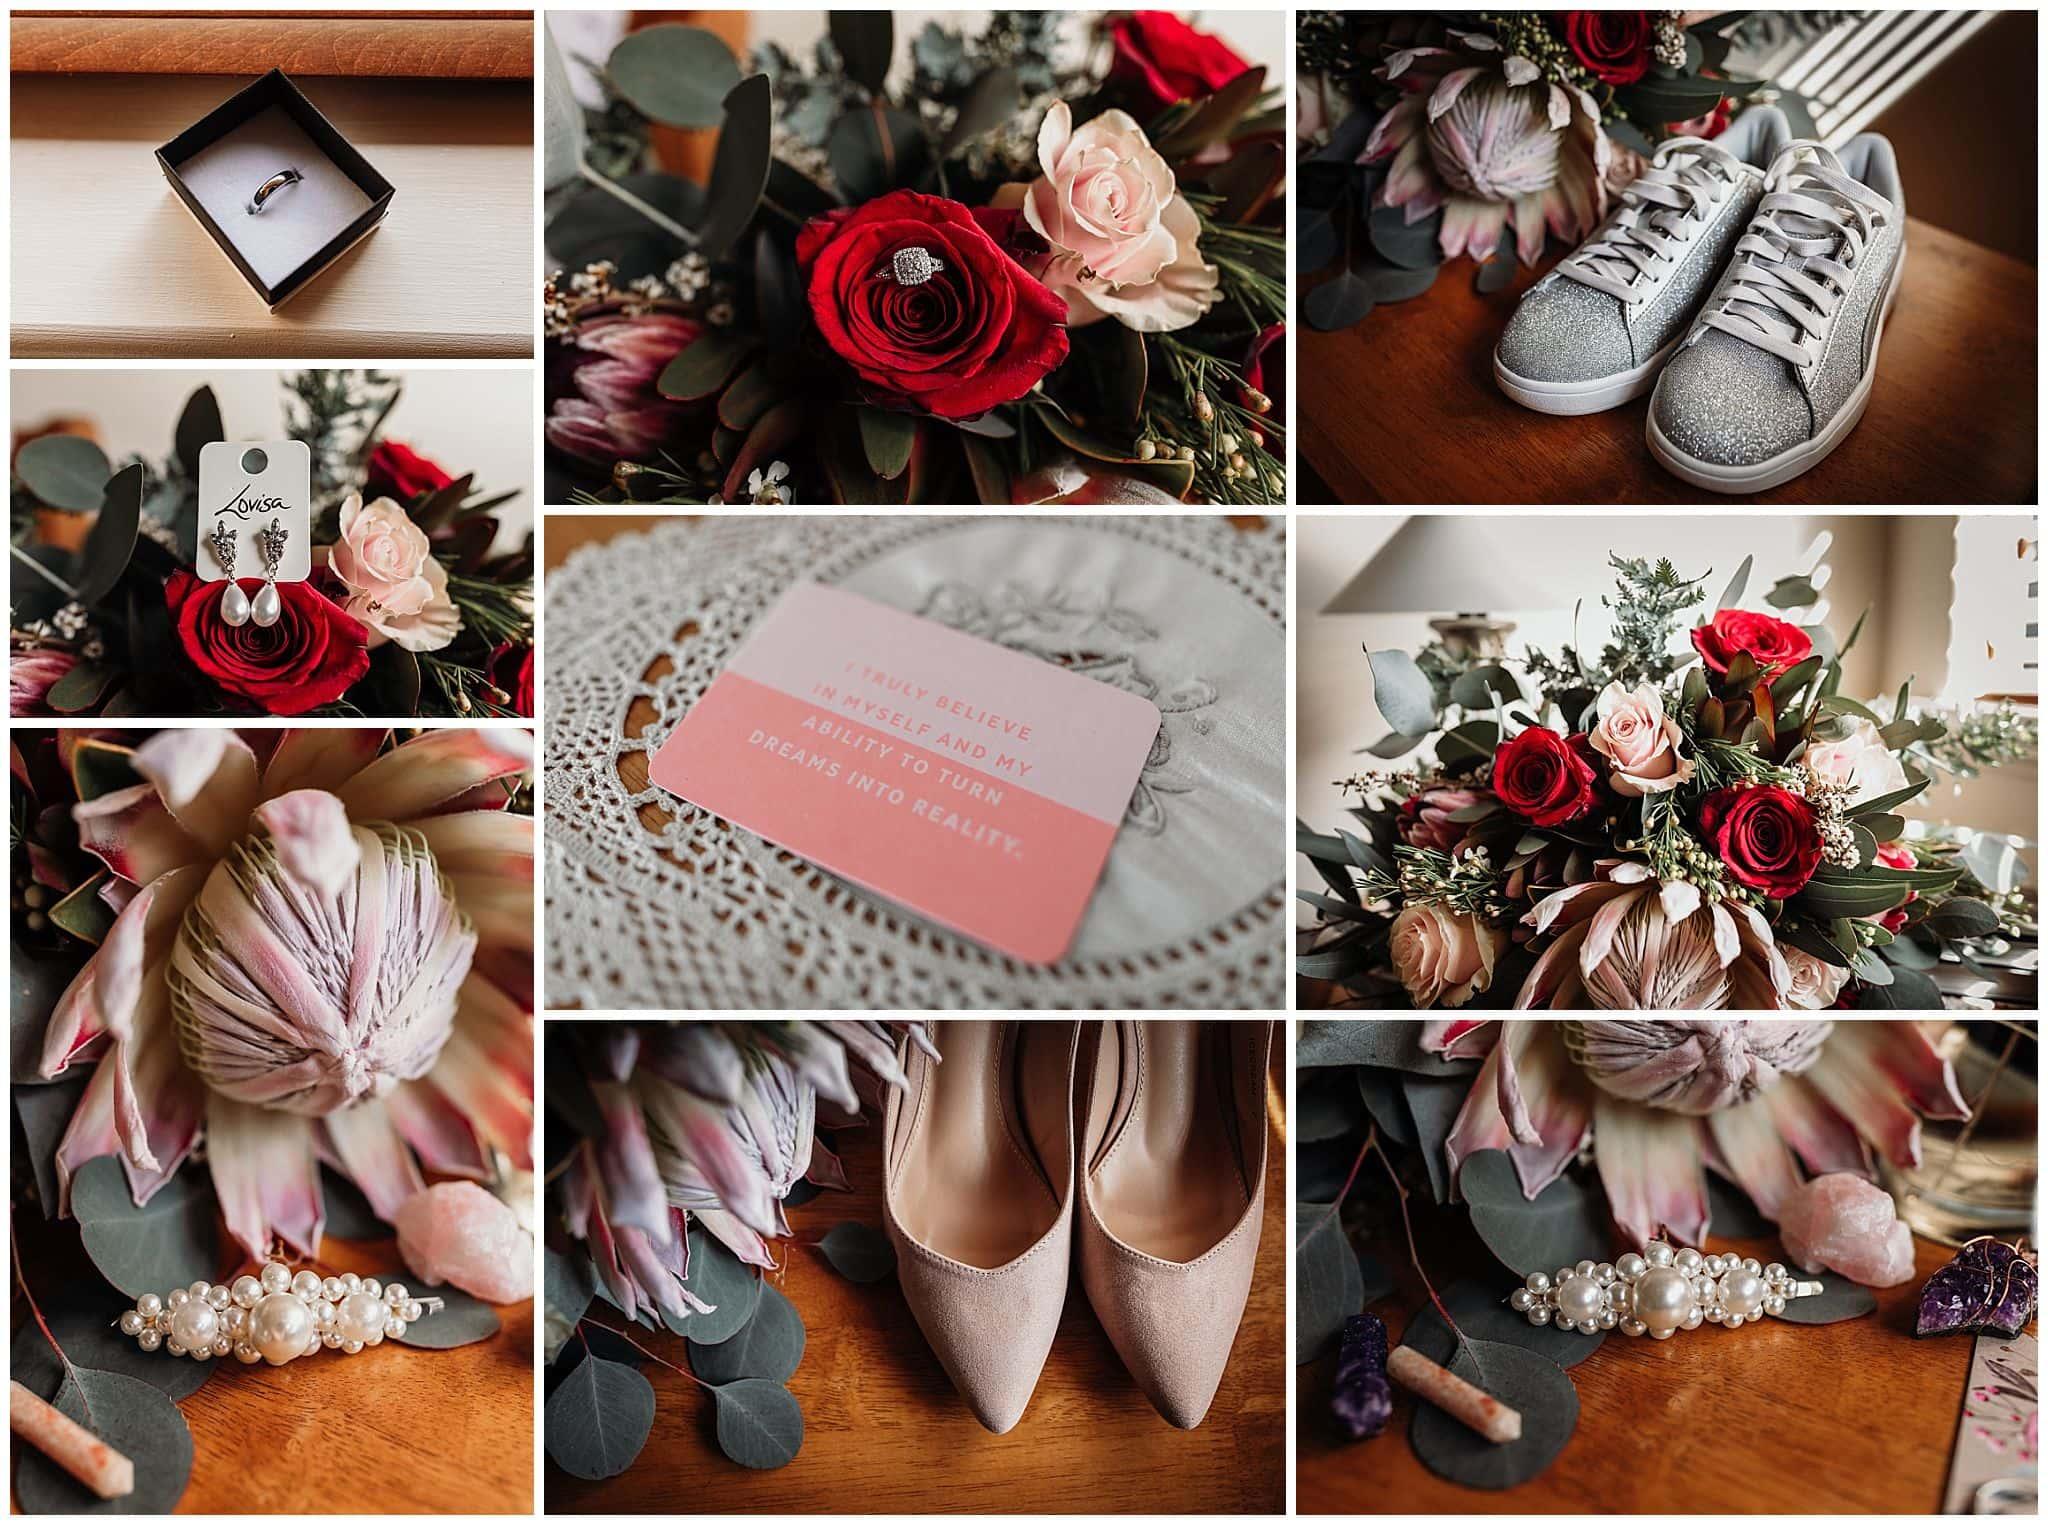 bride-preparations-shoes-rings